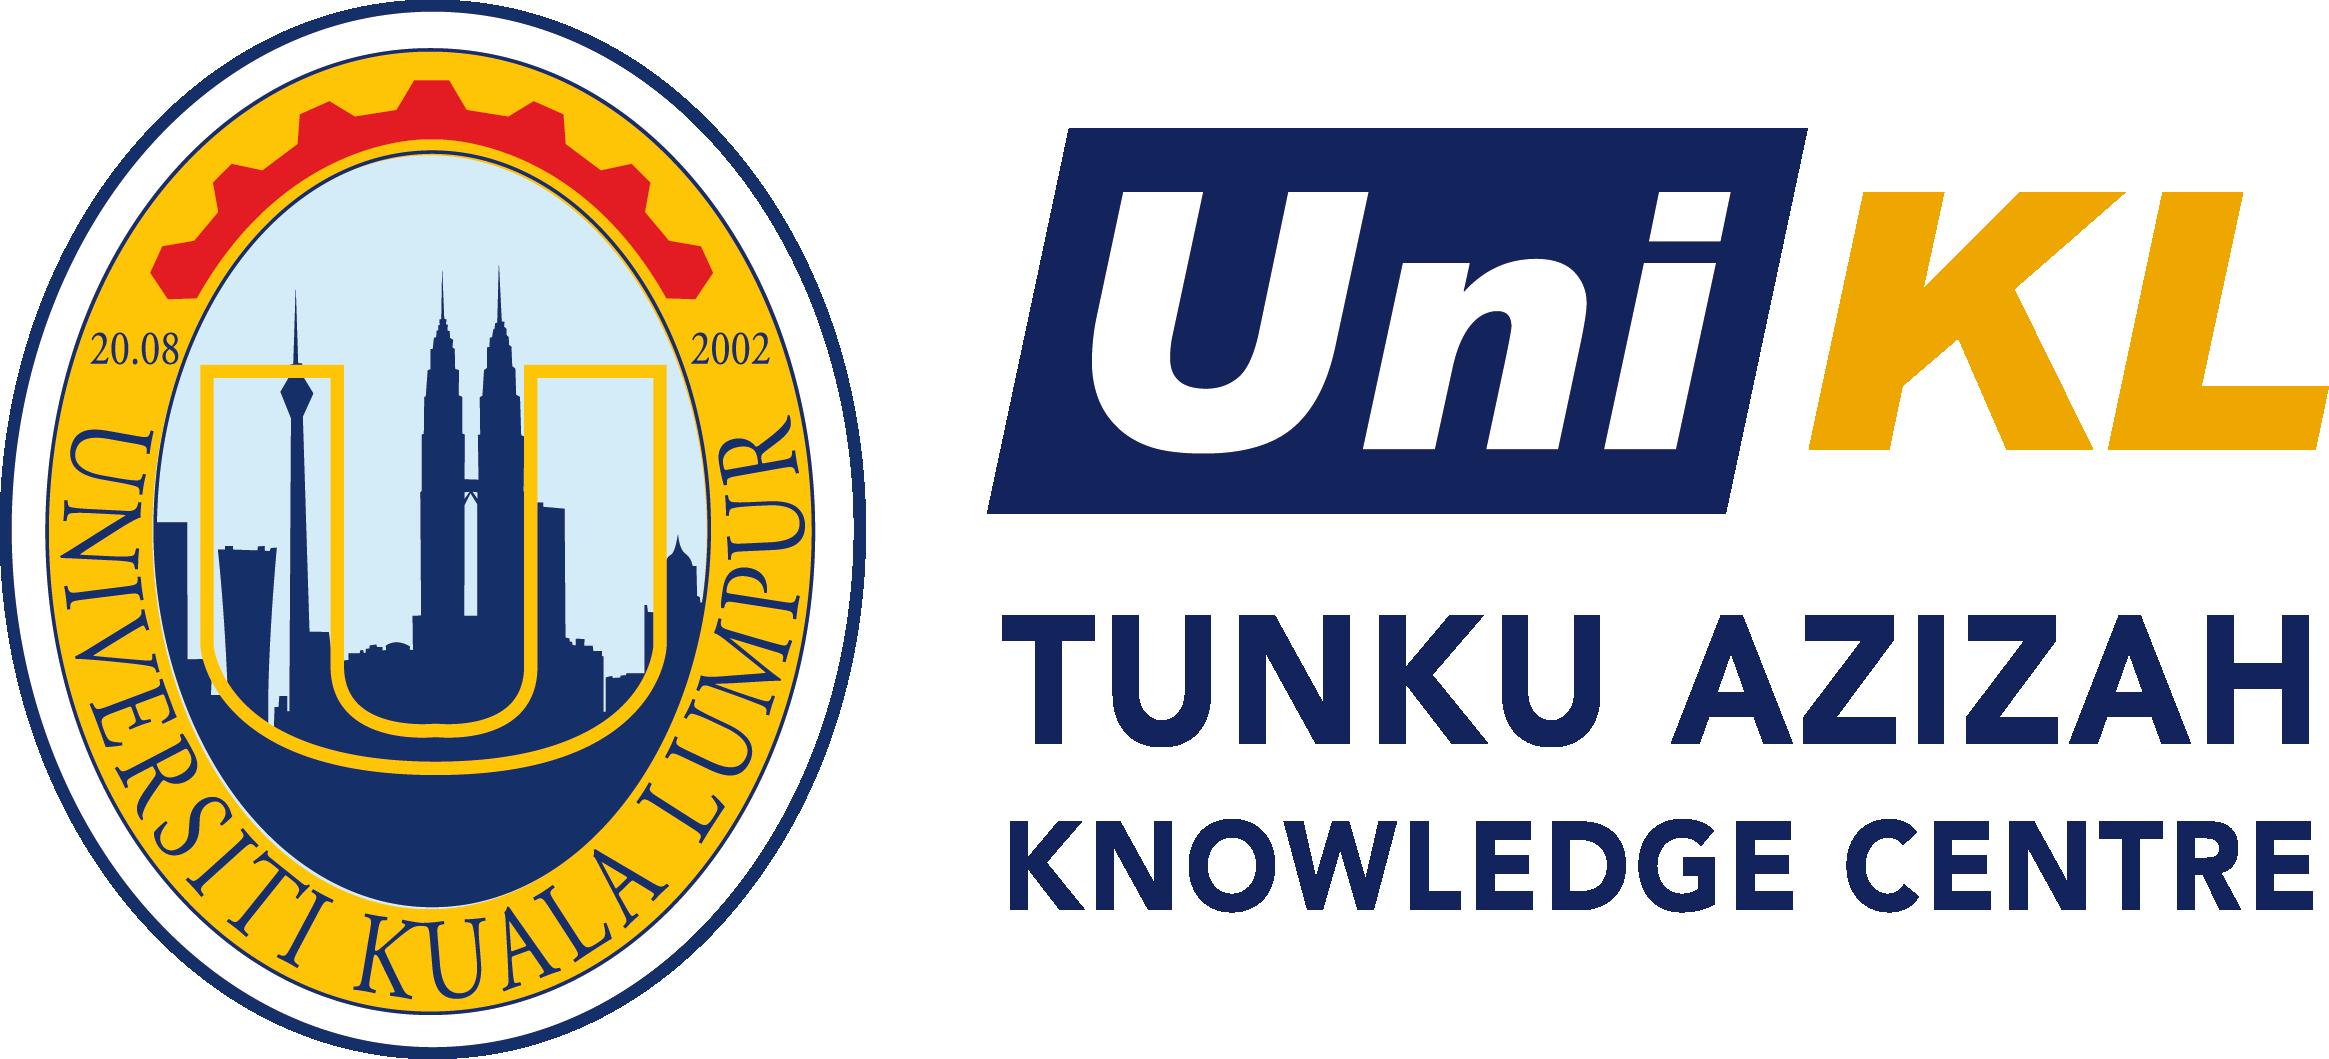 UniKL Library